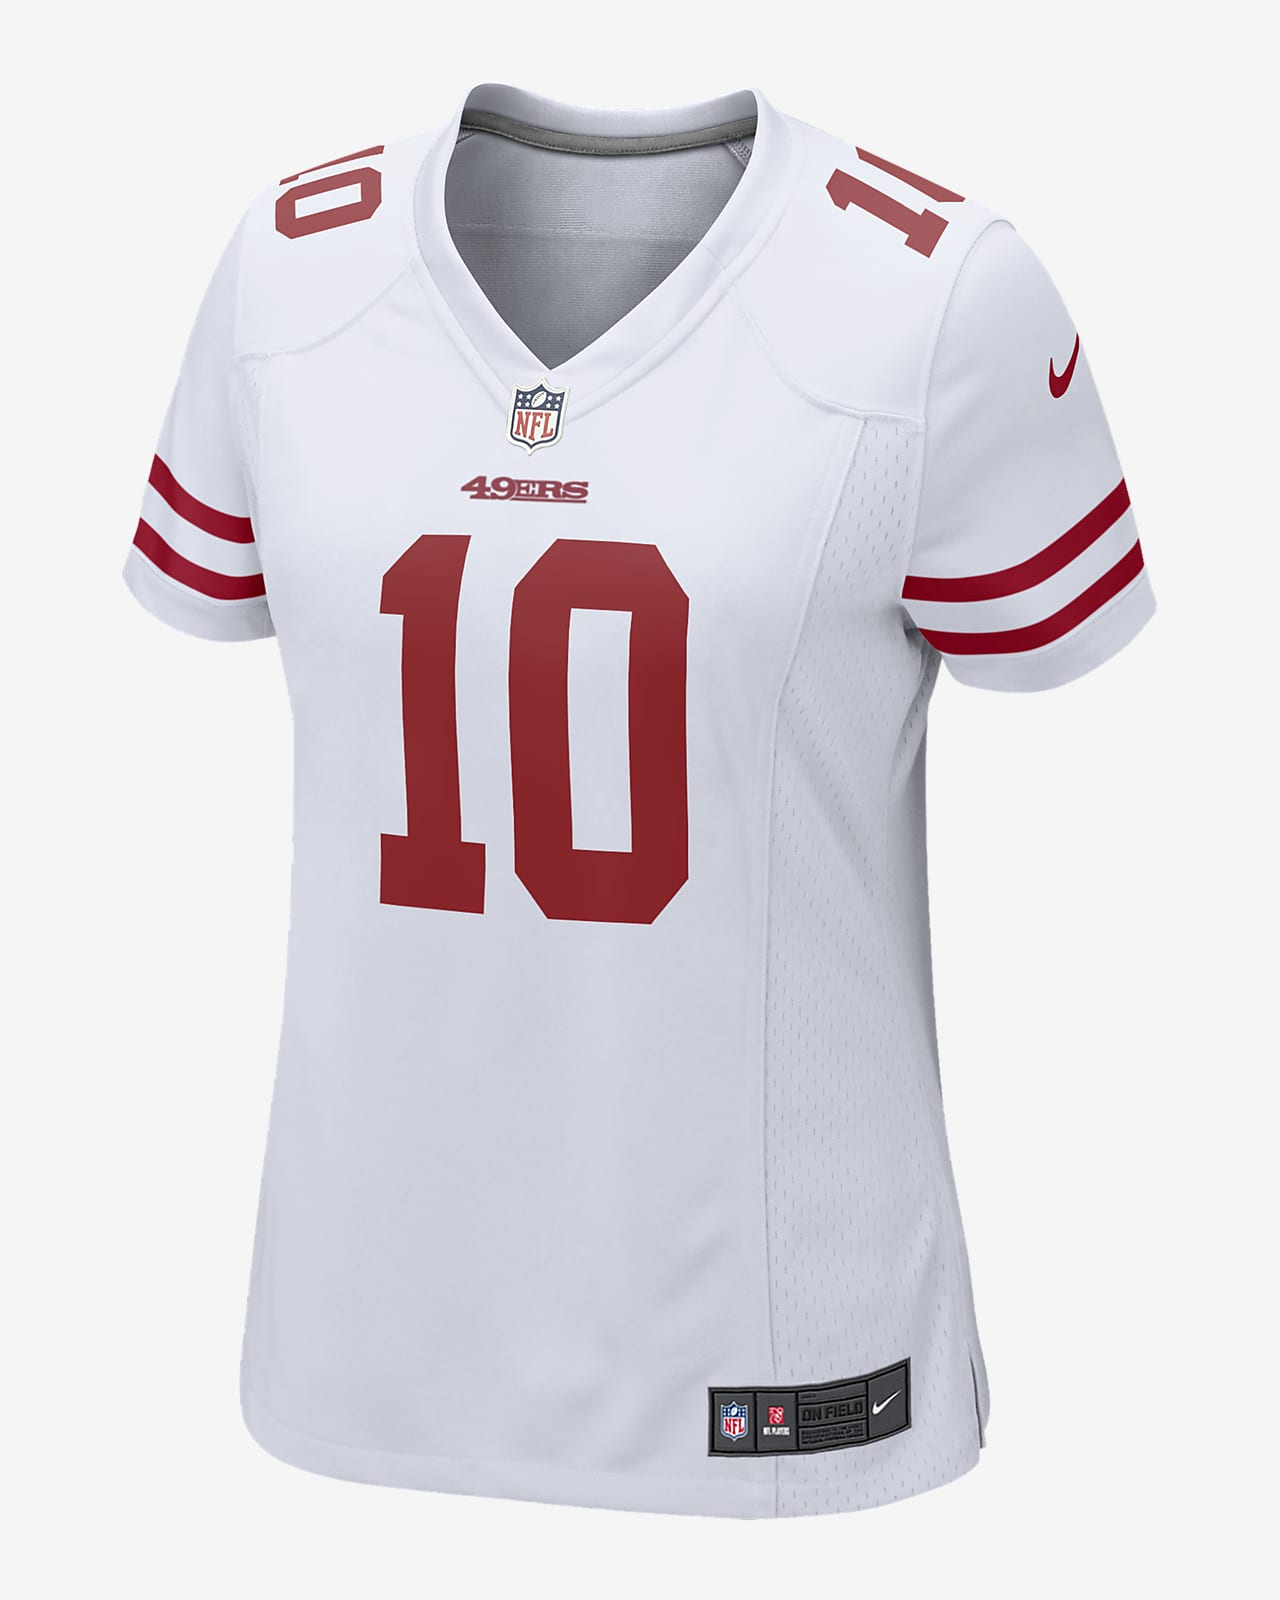 NFL San Francisco 49ers (Jimmy Garoppolo) Women's Game Football Jersey